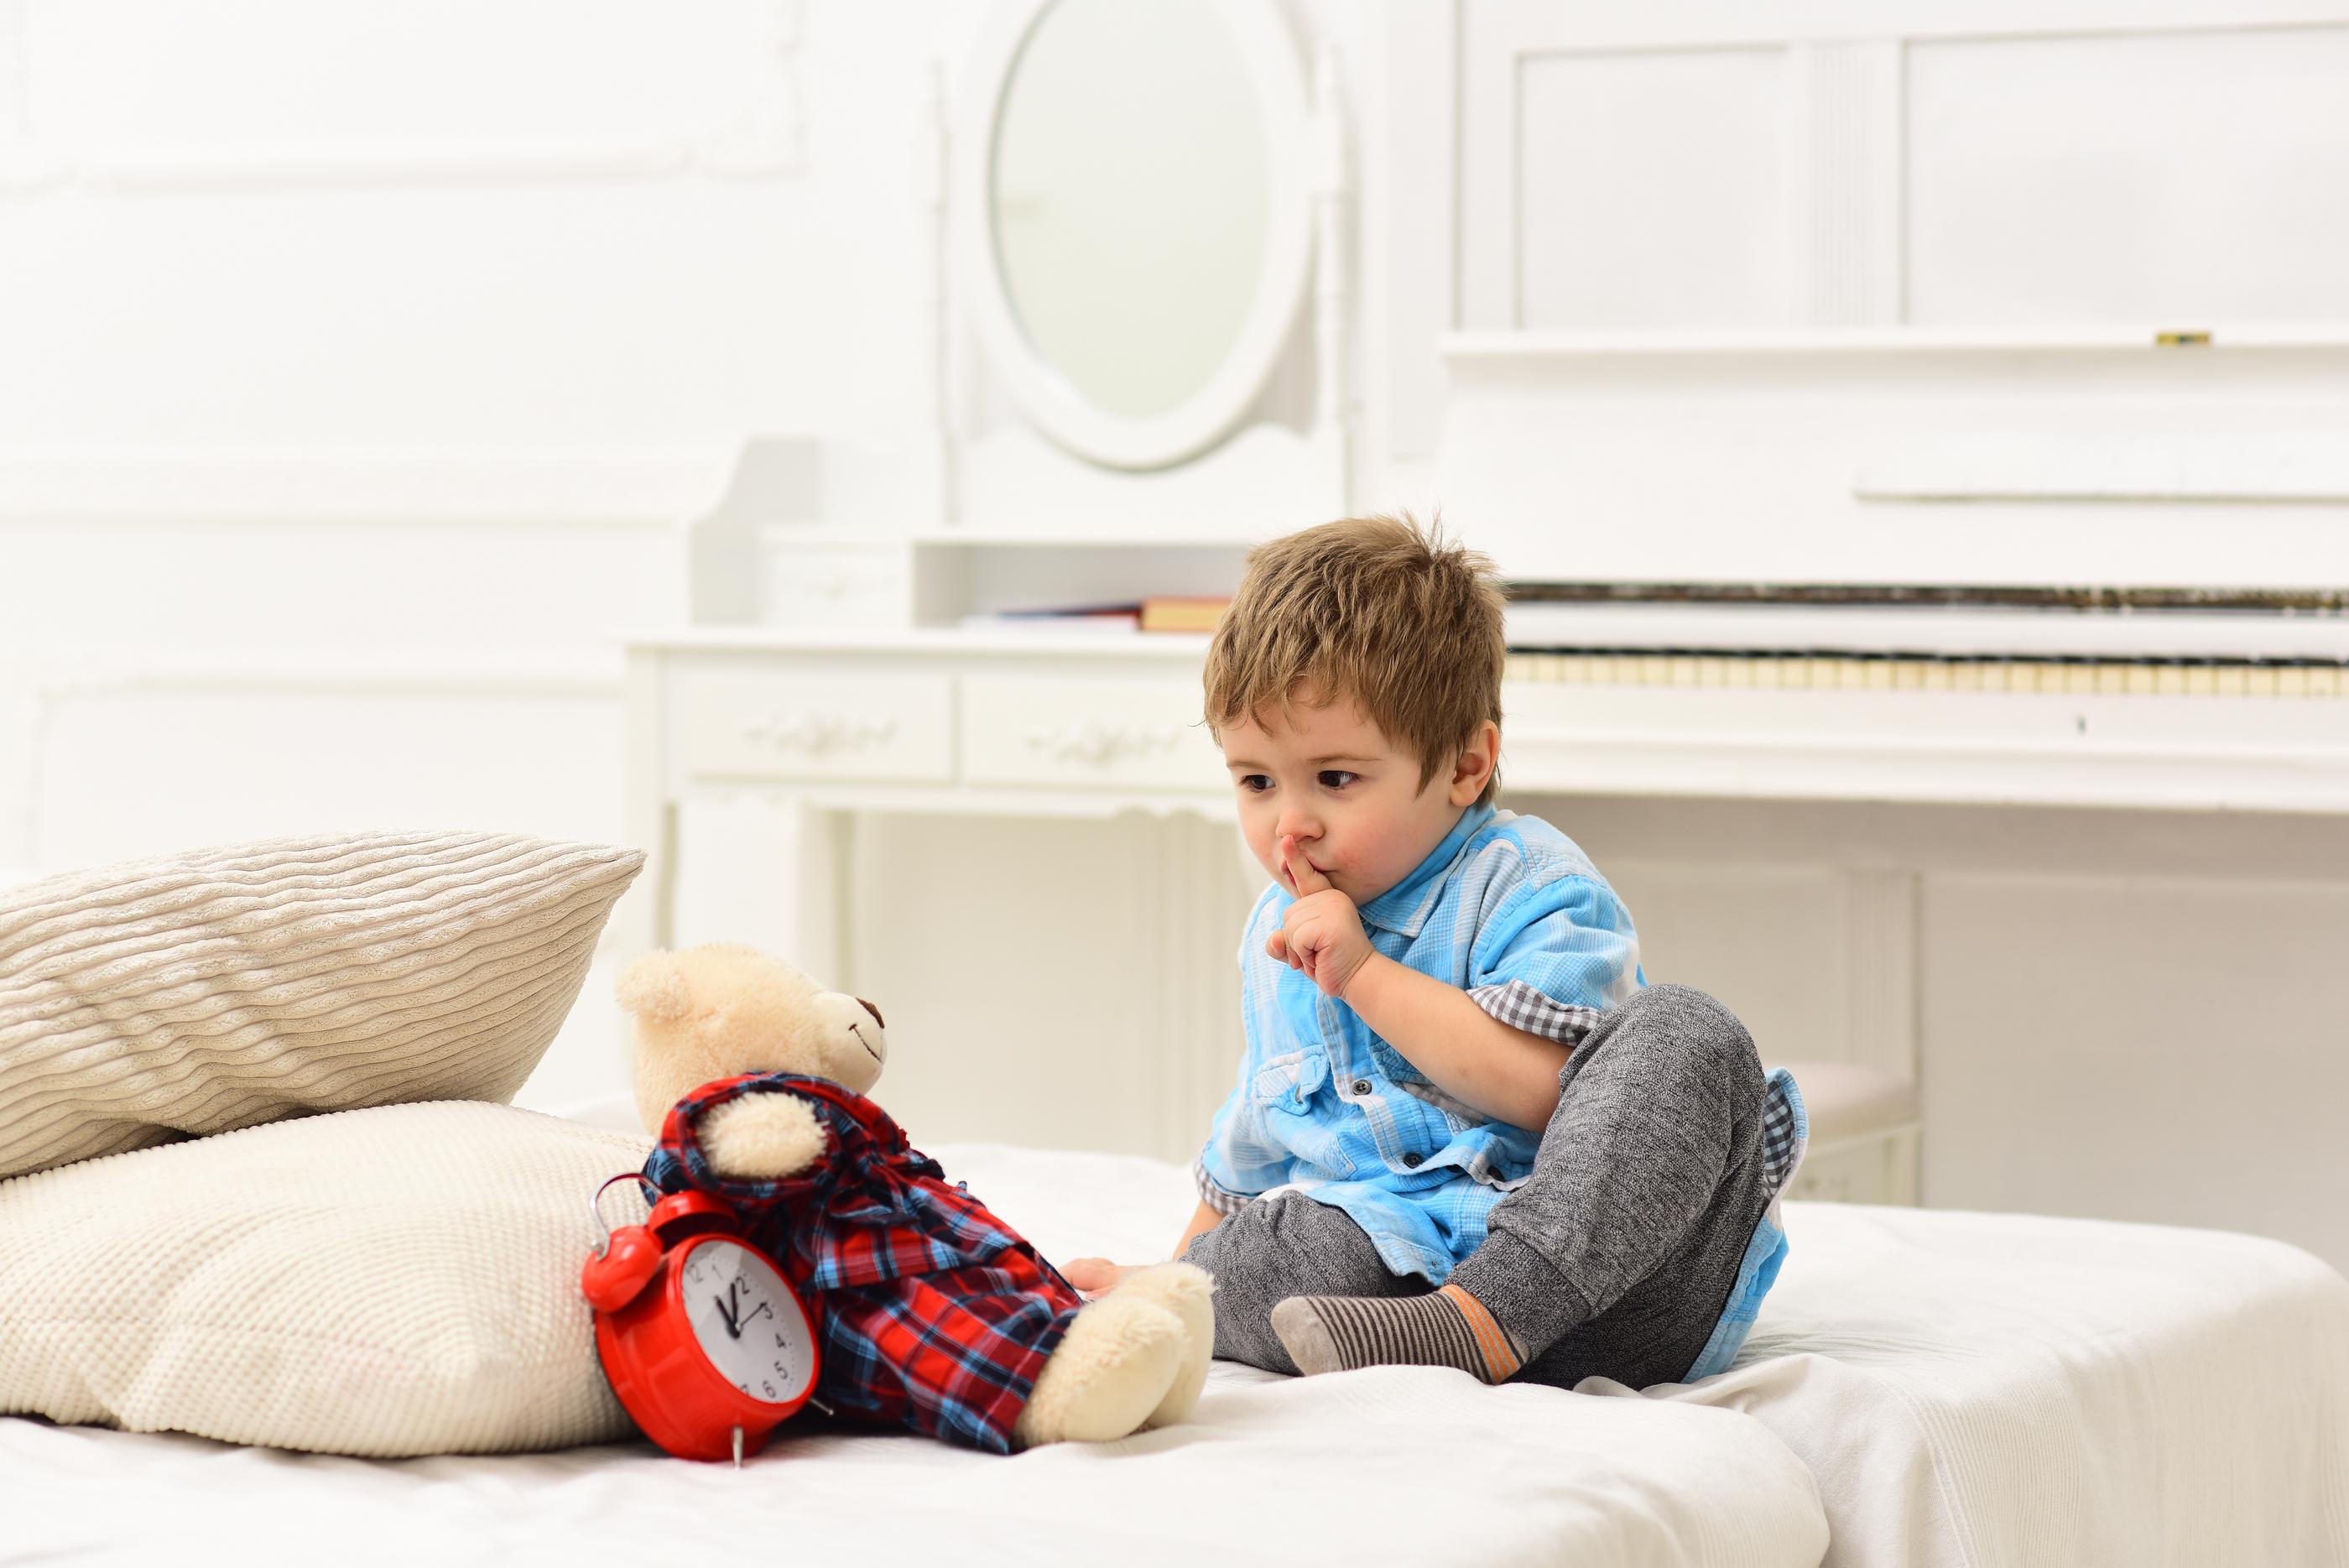 bigstock-Baby-Playing-Bear-Playing-On-W-235754236.jpg